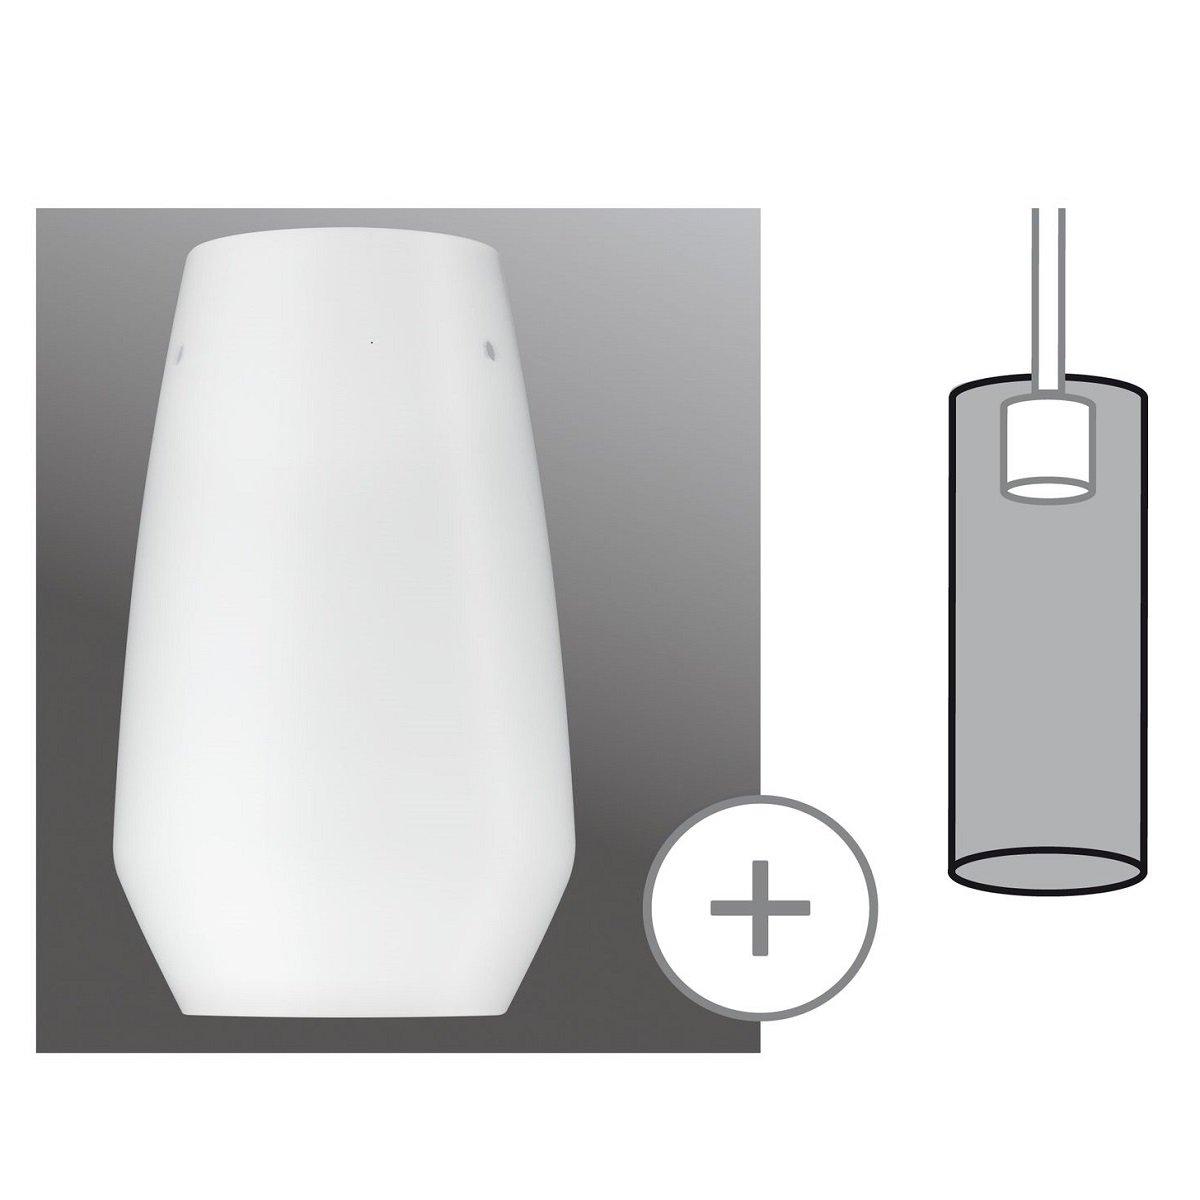 paulmann no 95351 lampenschirm urail 2easy glas vento. Black Bedroom Furniture Sets. Home Design Ideas